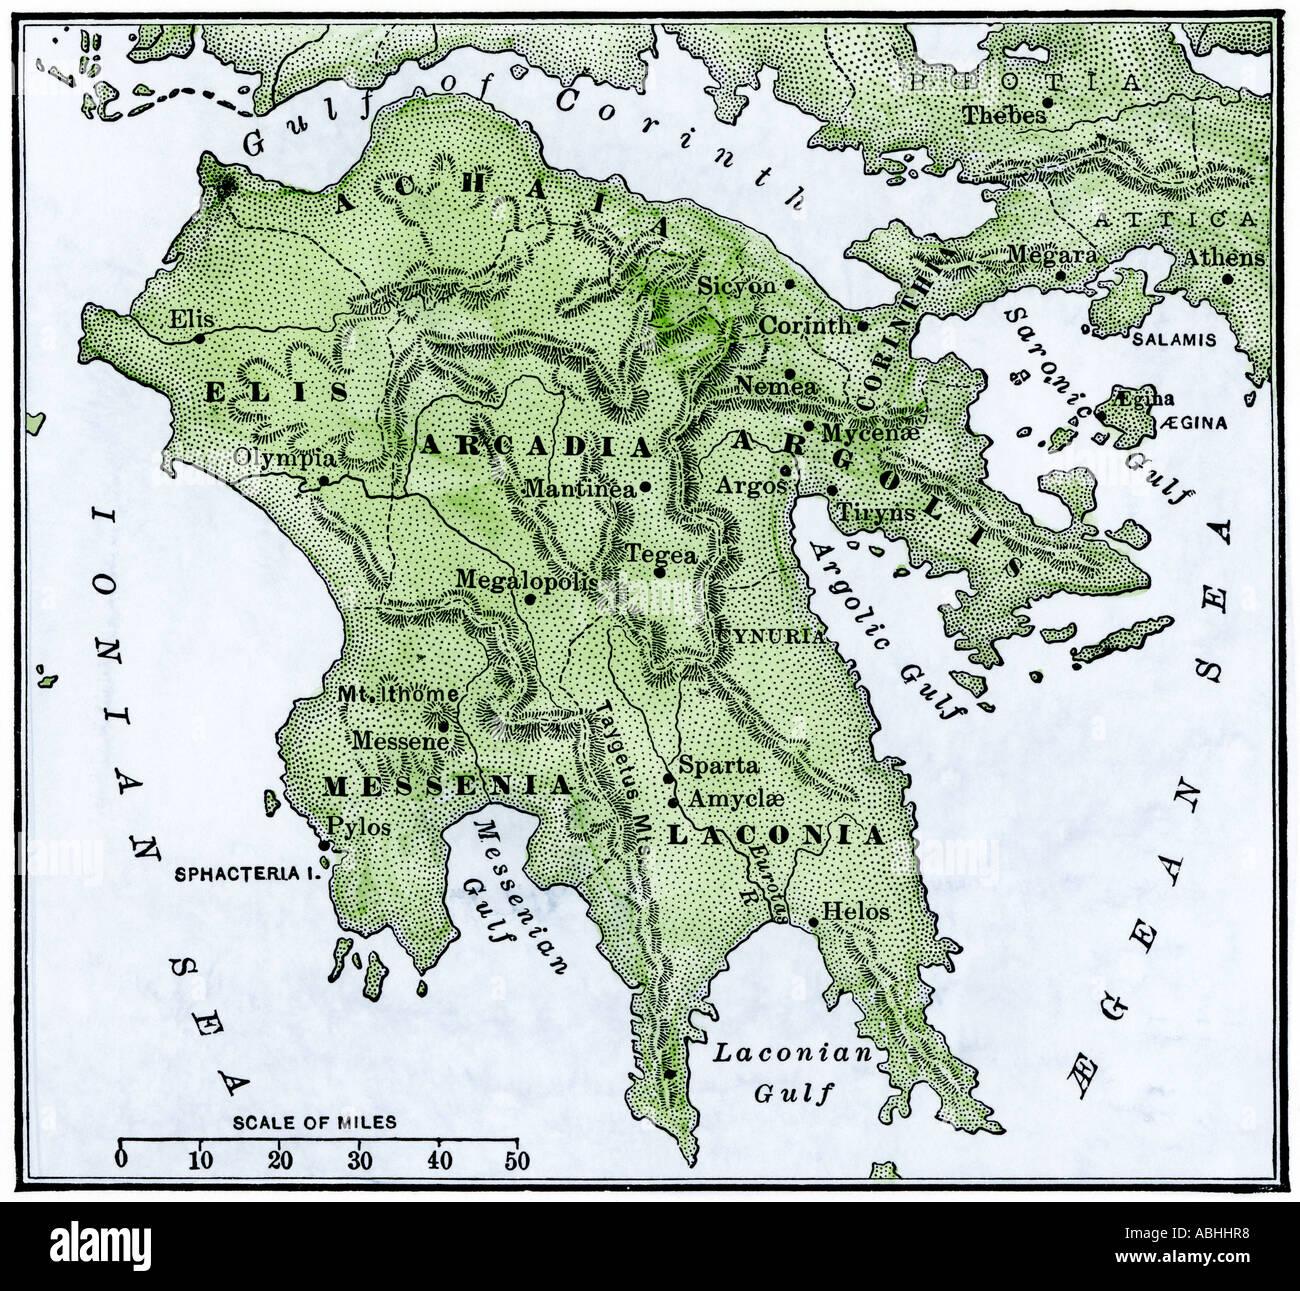 Karte des antiken Griechenland Peloponnes Stockbild